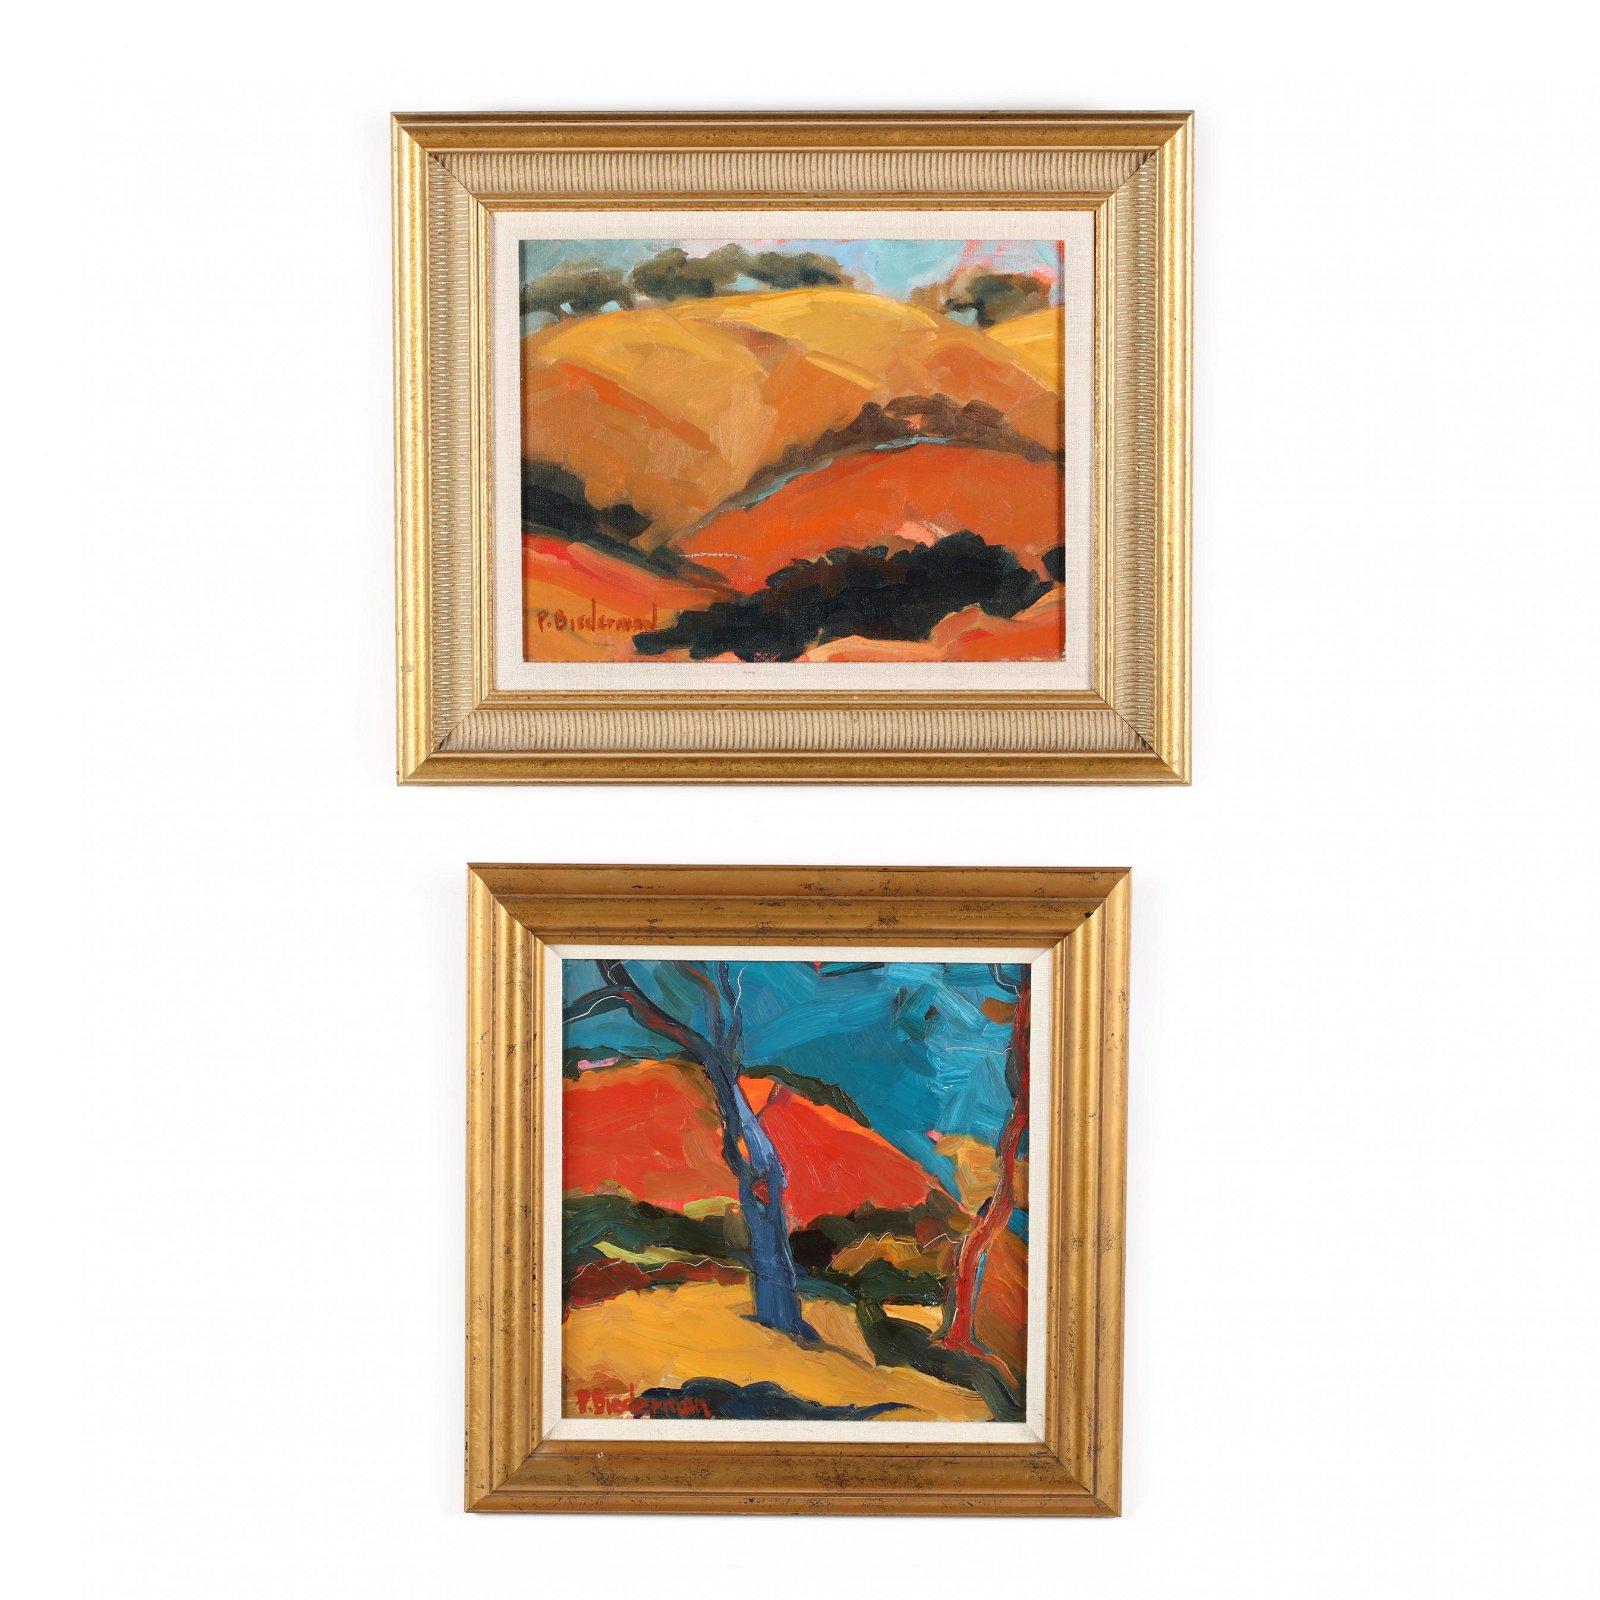 Patty Biederman (CA/VA), Two Landscape Paintings